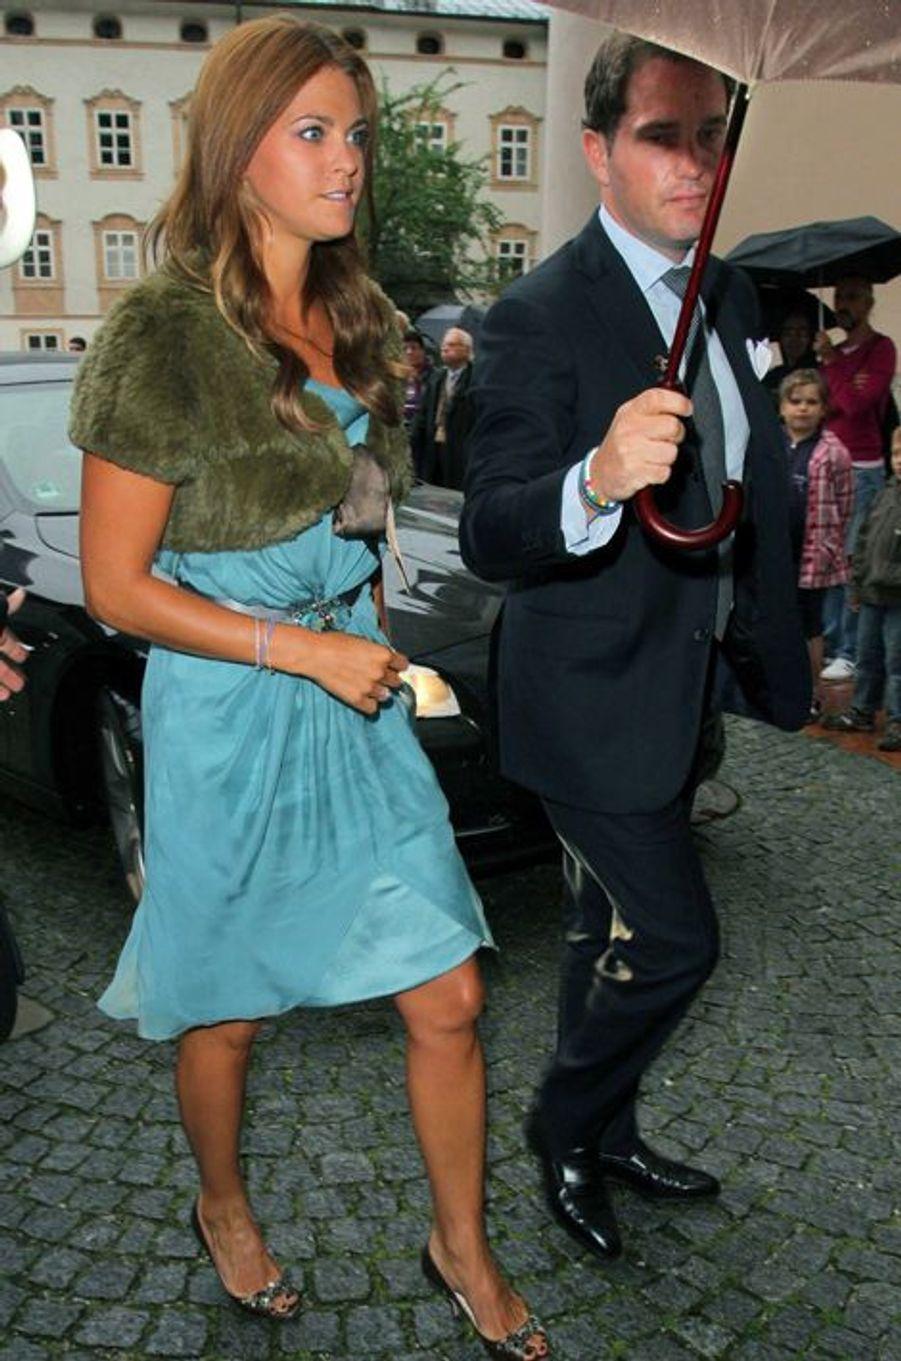 La princesse Madeleine de Suède, le 7 août 2011